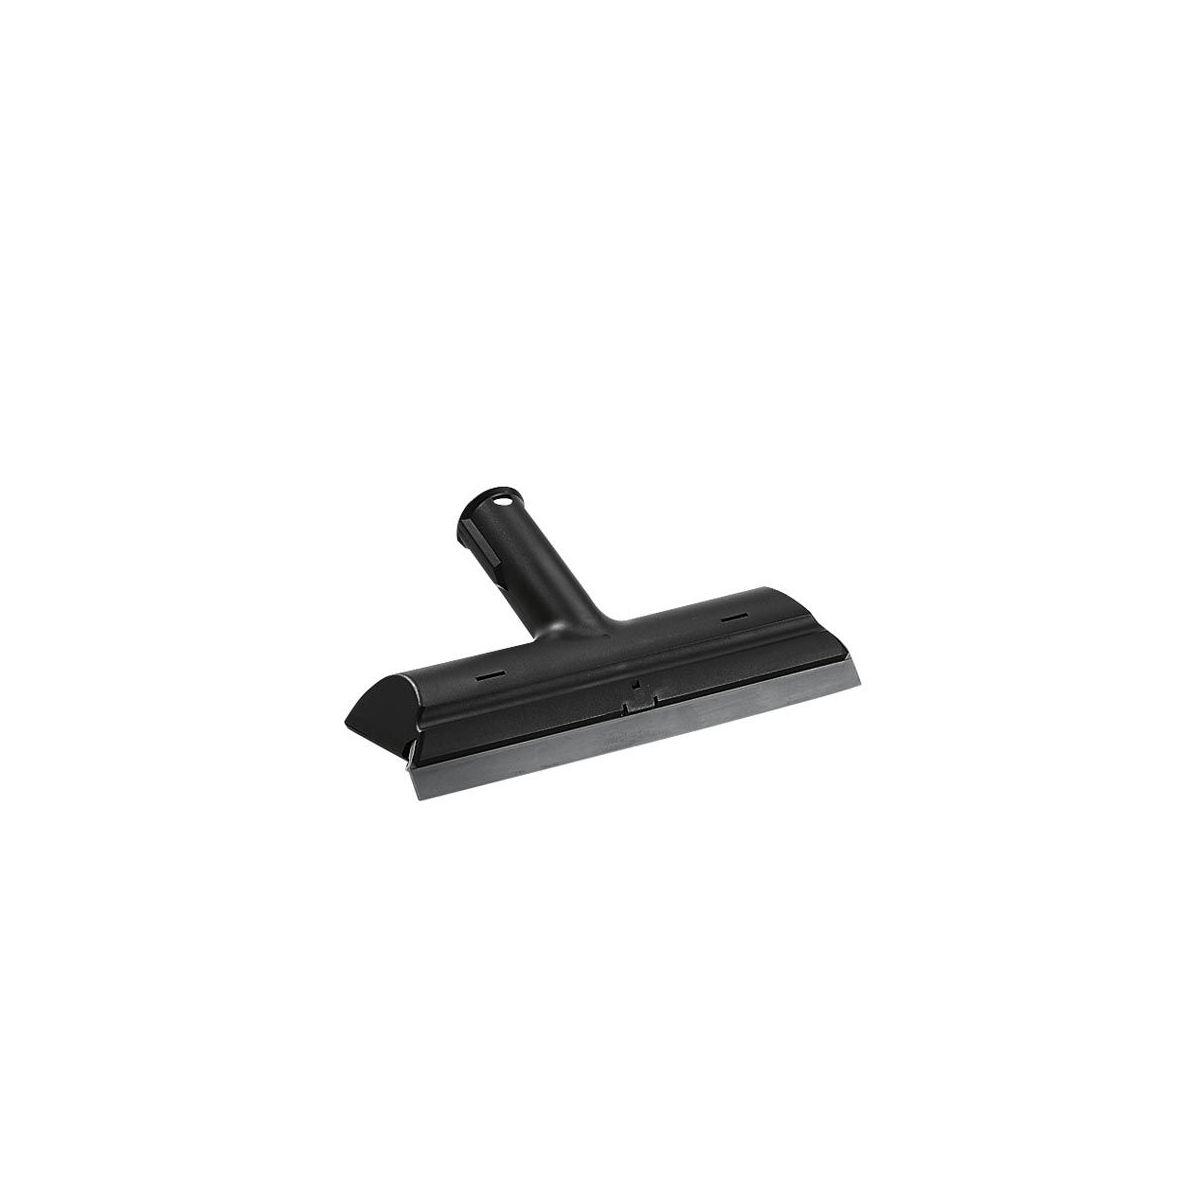 k rcher brosse raclette pour vitres comparer avec. Black Bedroom Furniture Sets. Home Design Ideas